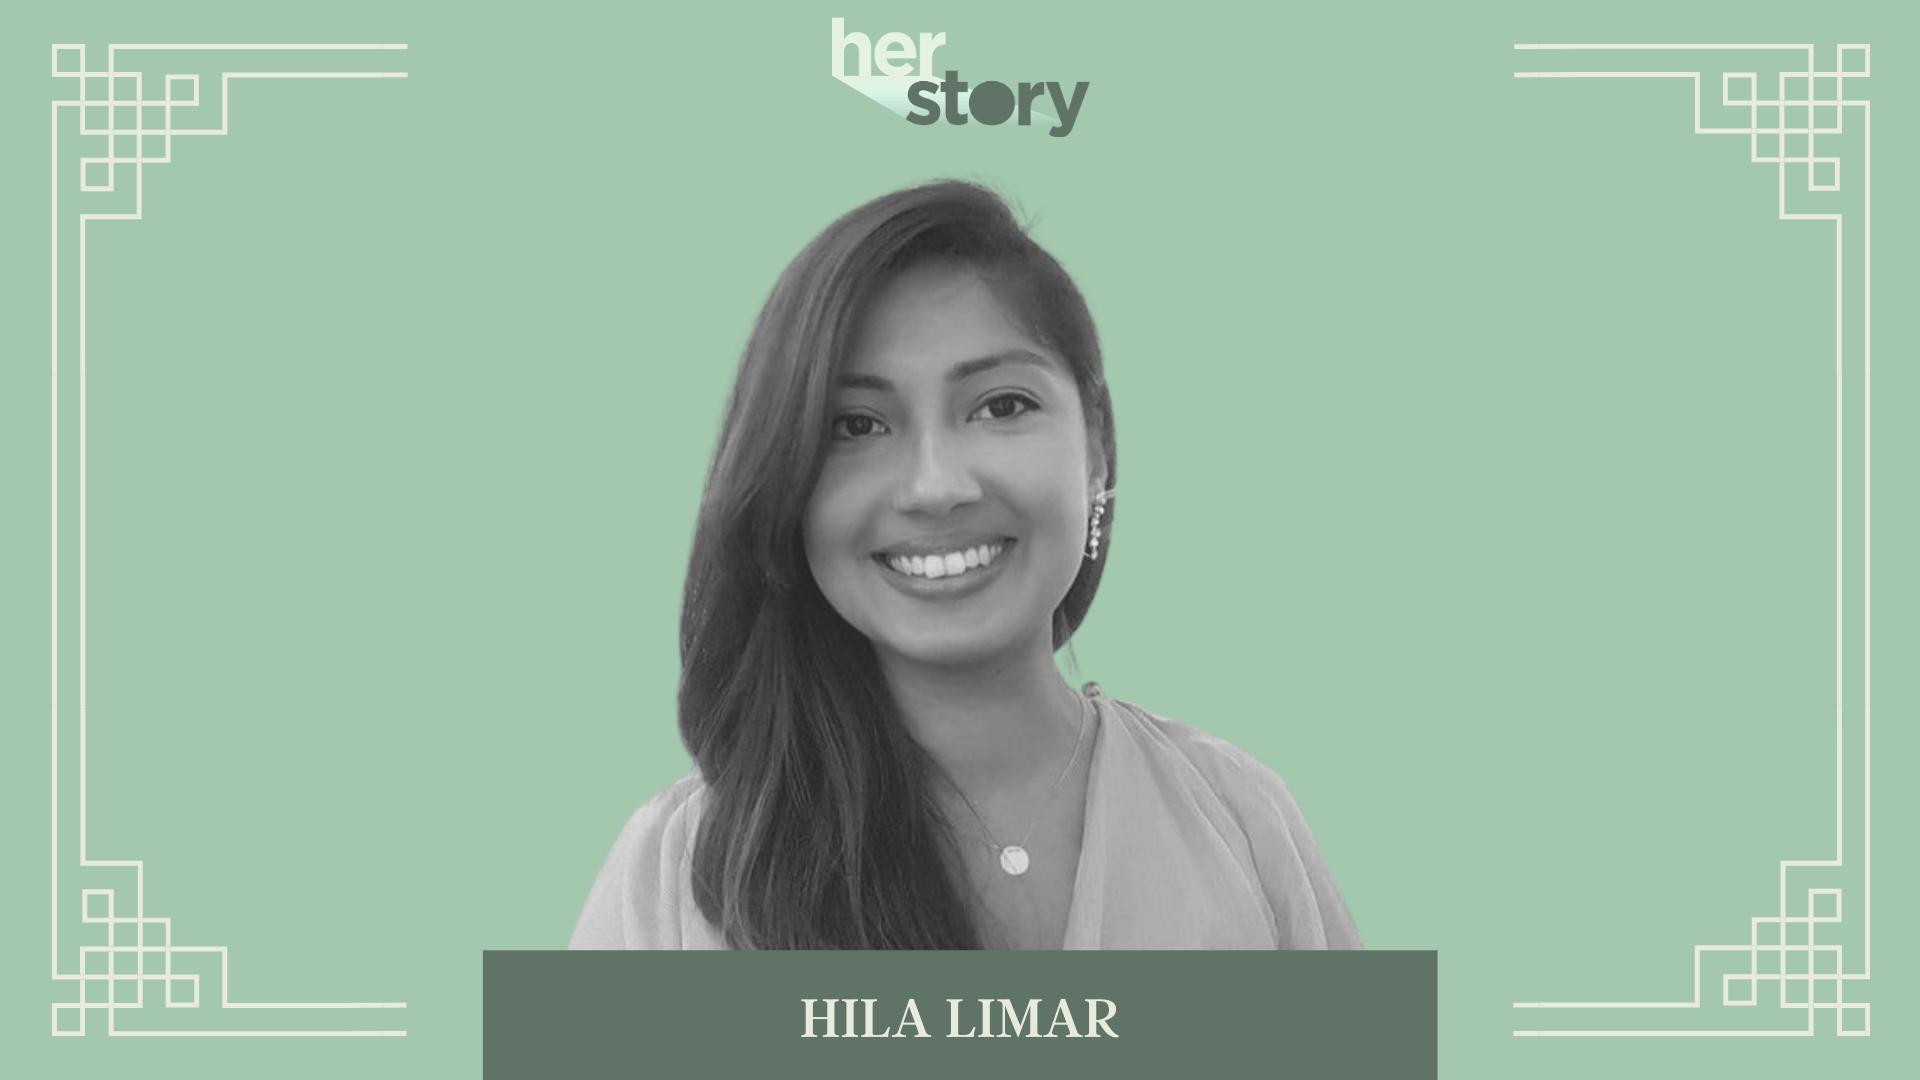 Hila Limar